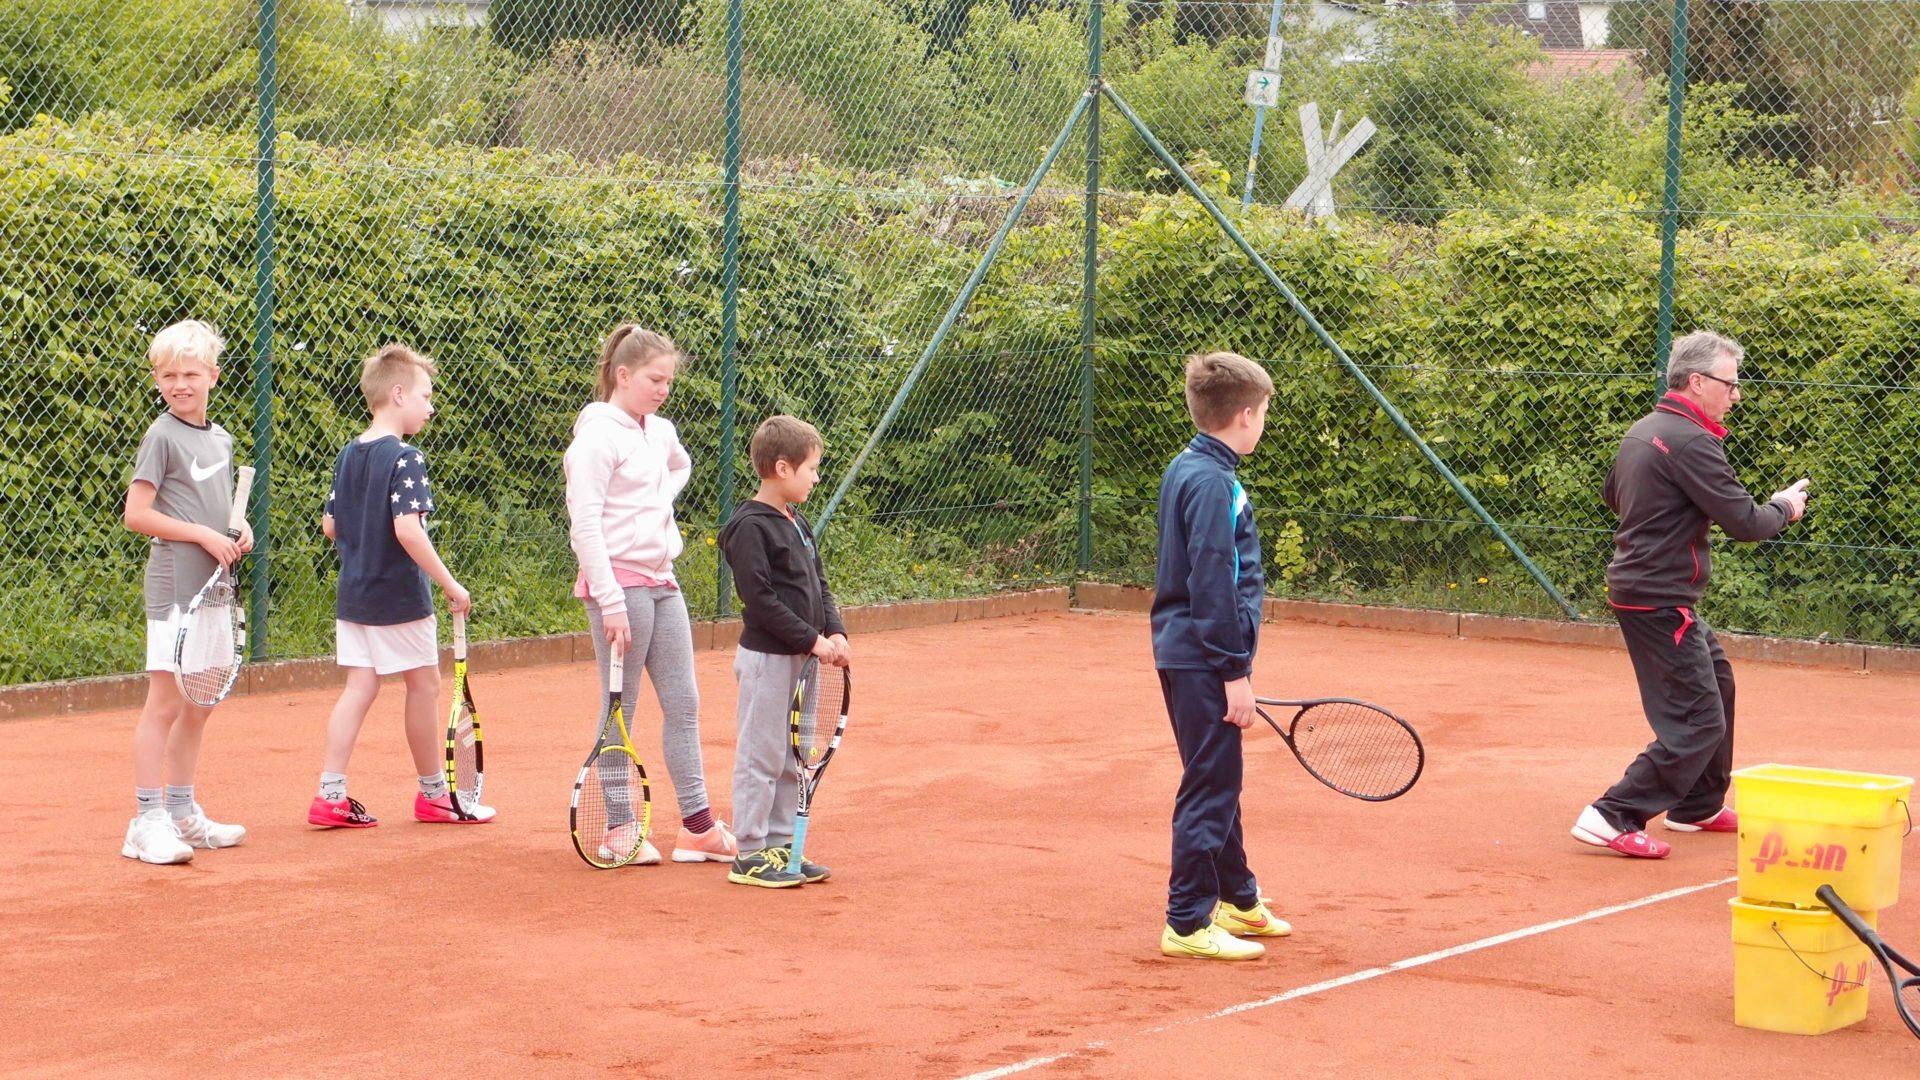 Entdecke Tennis beim TC 75 Groß-Bieberau